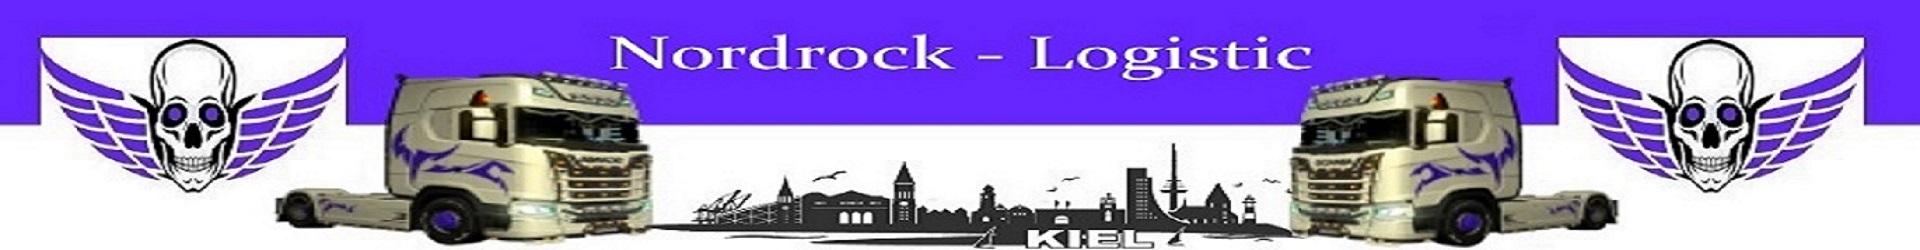 Nordrock - Logistic